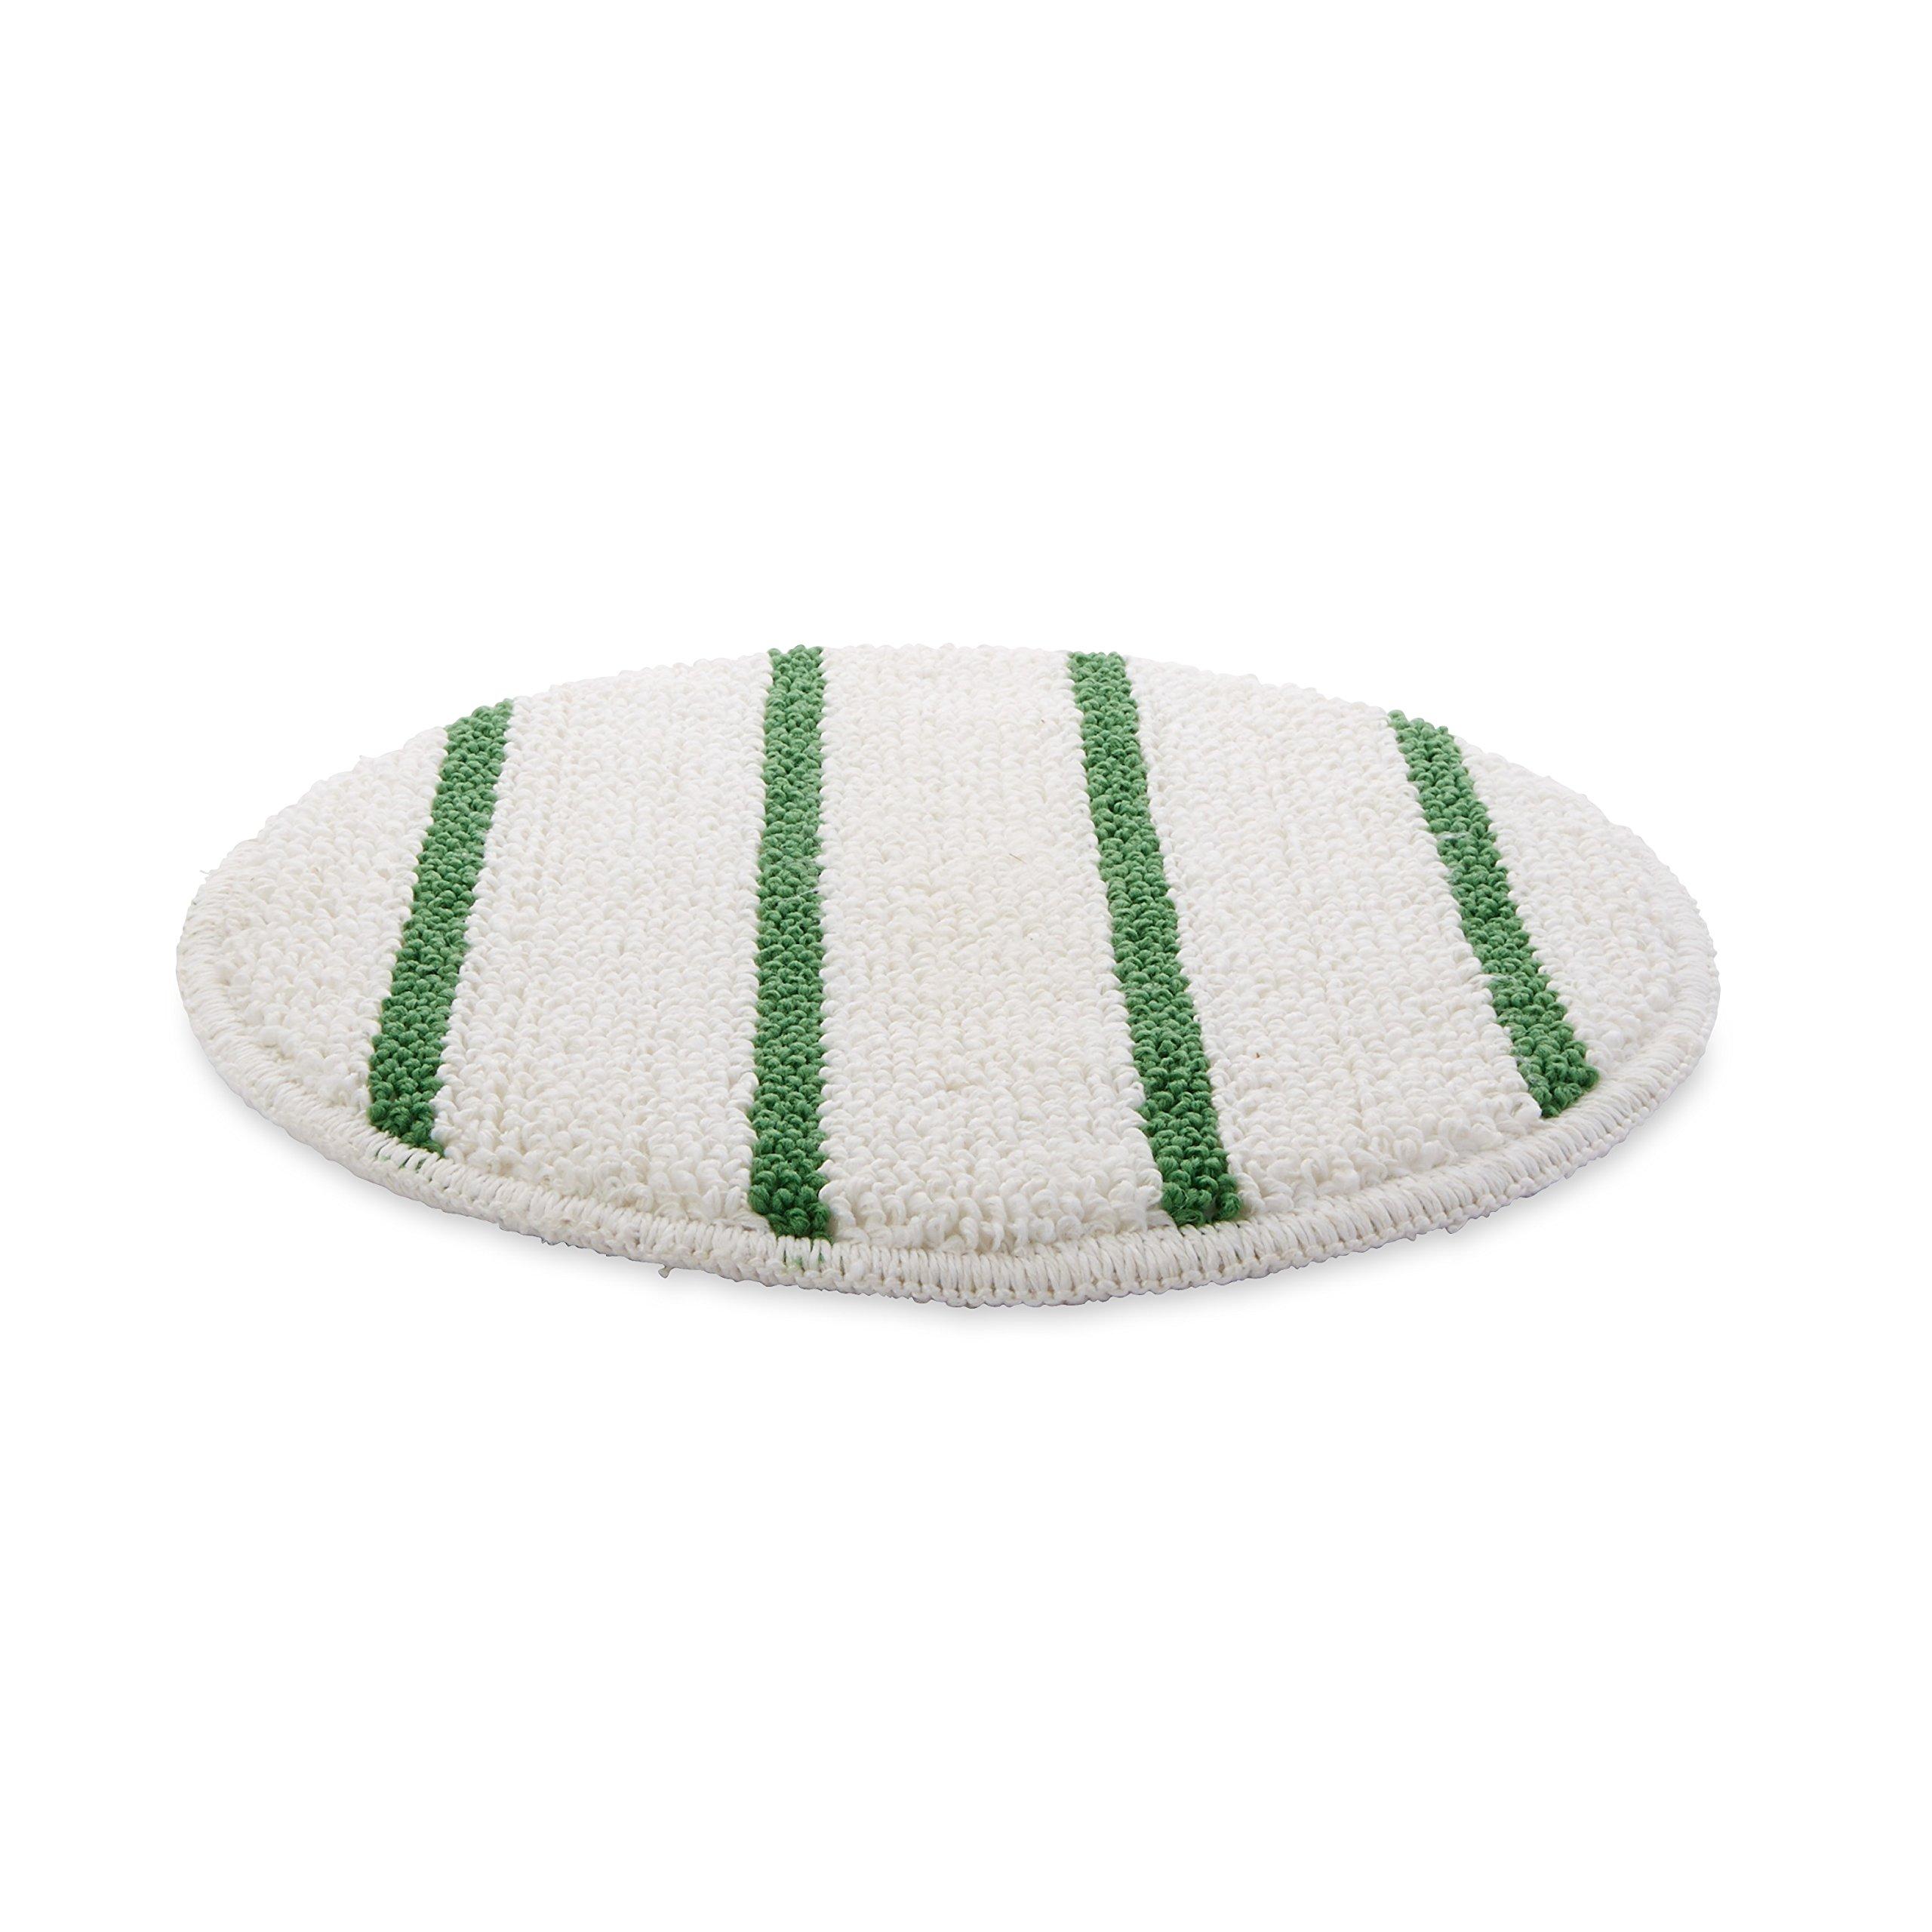 Rubbermaid Commercial Low-Profile Carpet Bonnet with Green Scrubber Strips, 17'', FGP26700WH00